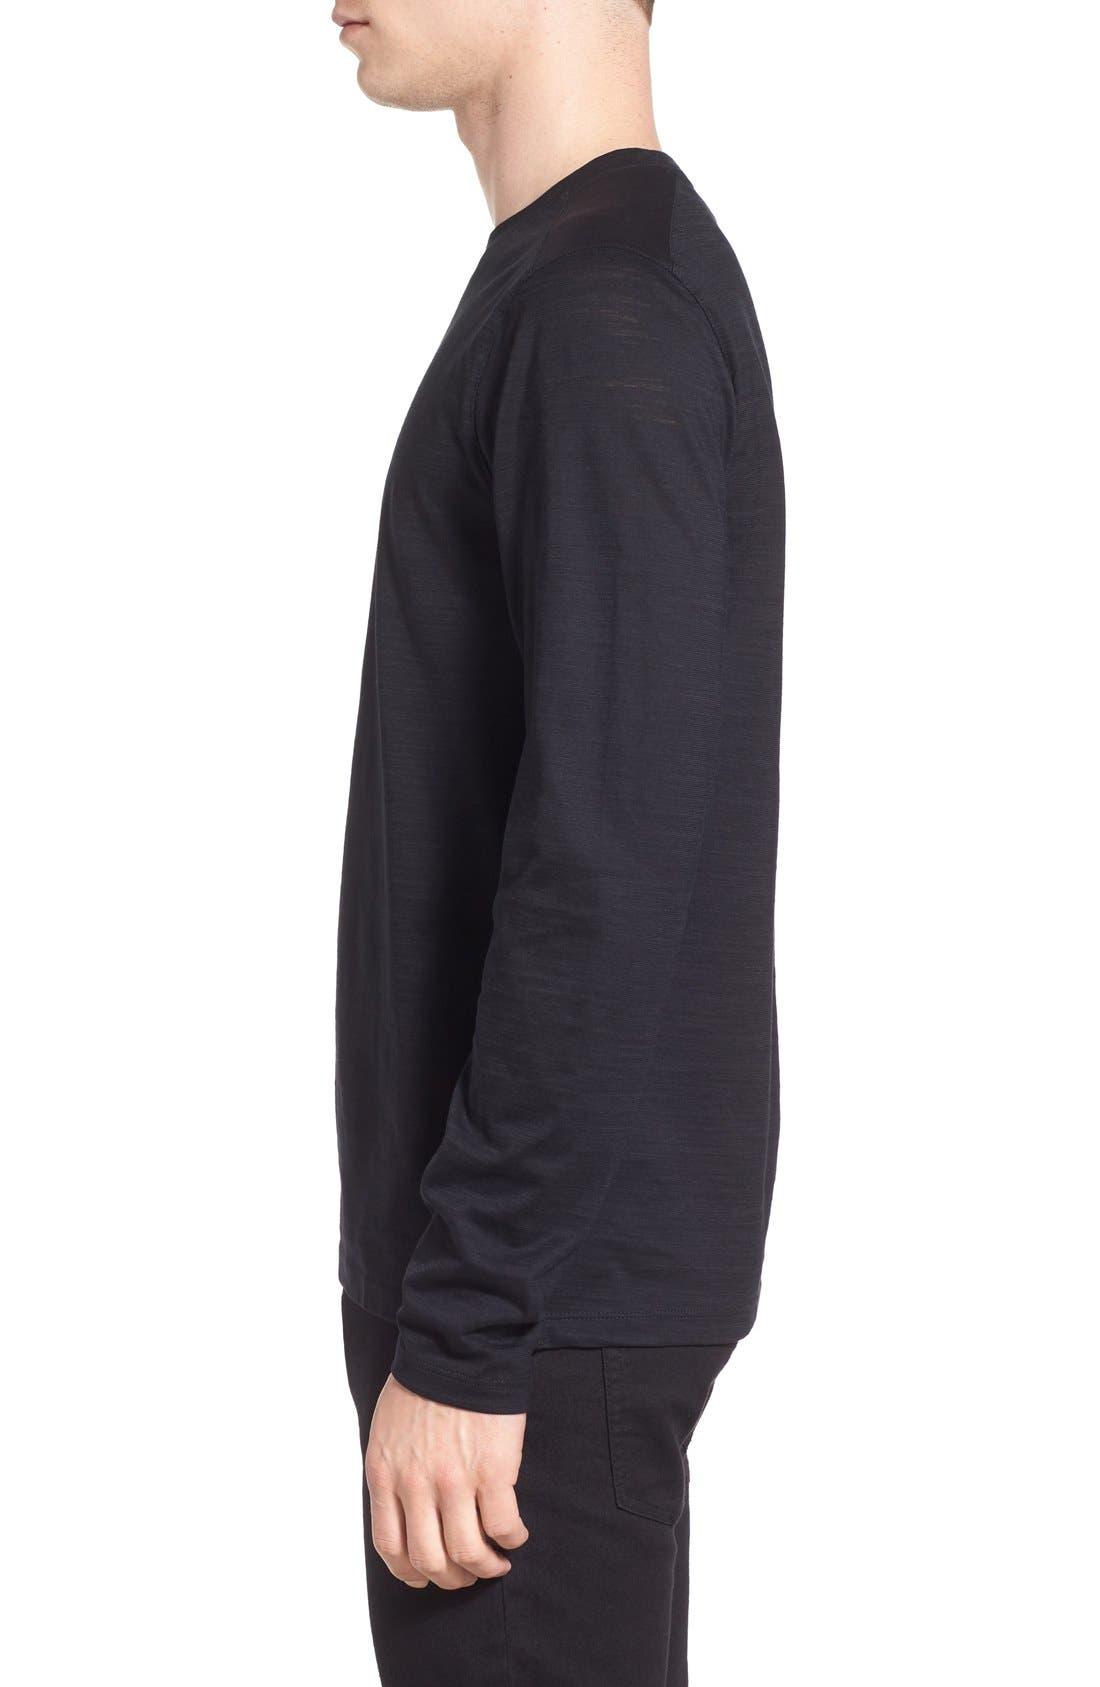 'Tenison' Slim Fit Long Sleeve T-Shirt,                             Alternate thumbnail 3, color,                             001